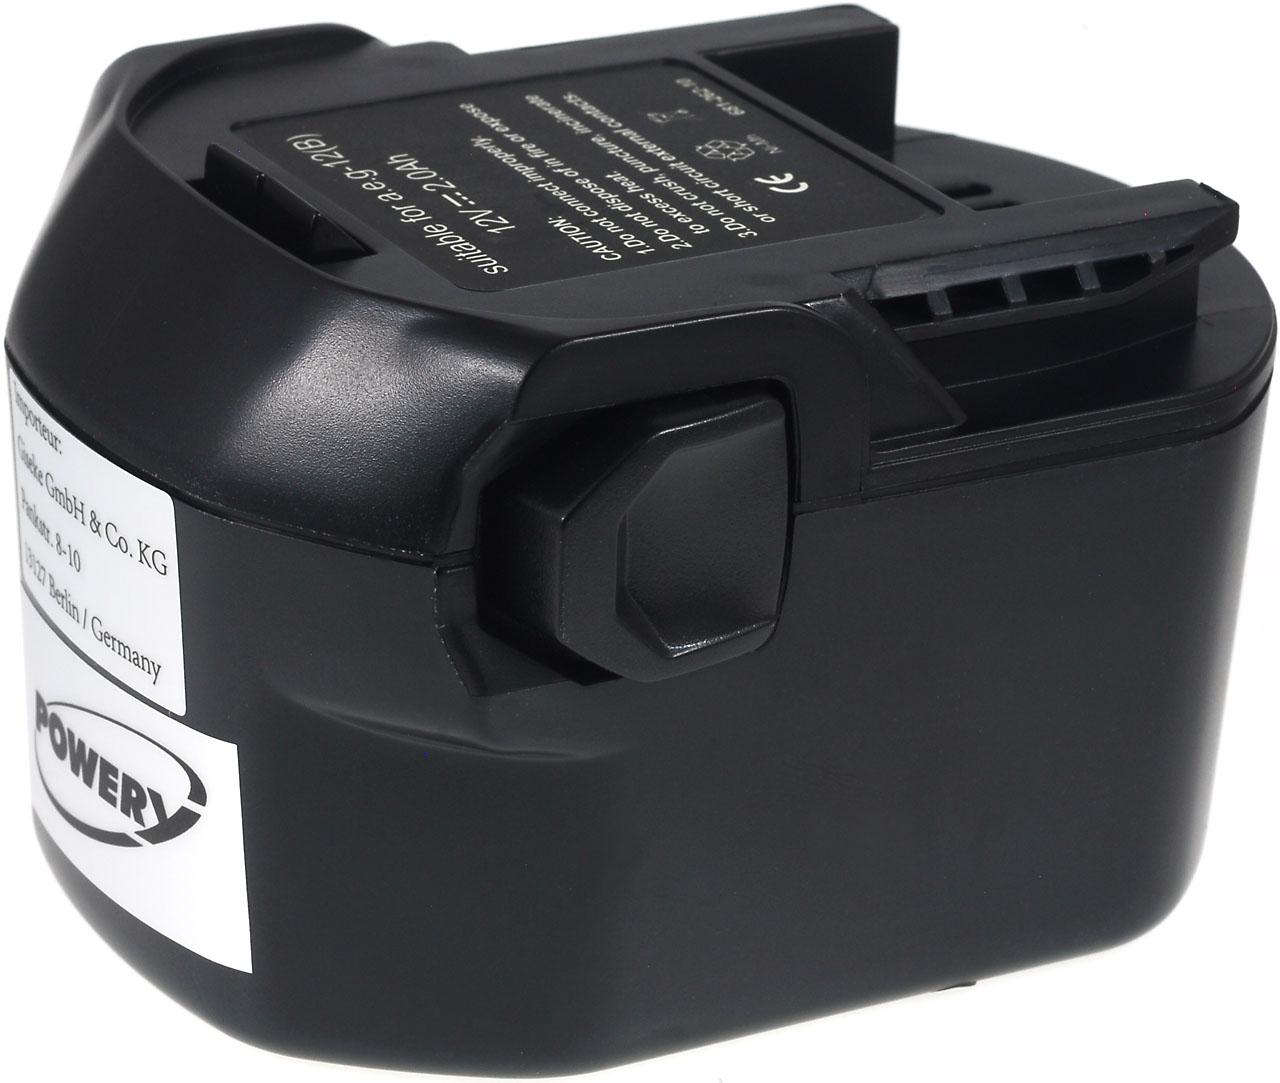 Acumulator compatibil Wrth model 0700 980 320 2000mAh NiMH